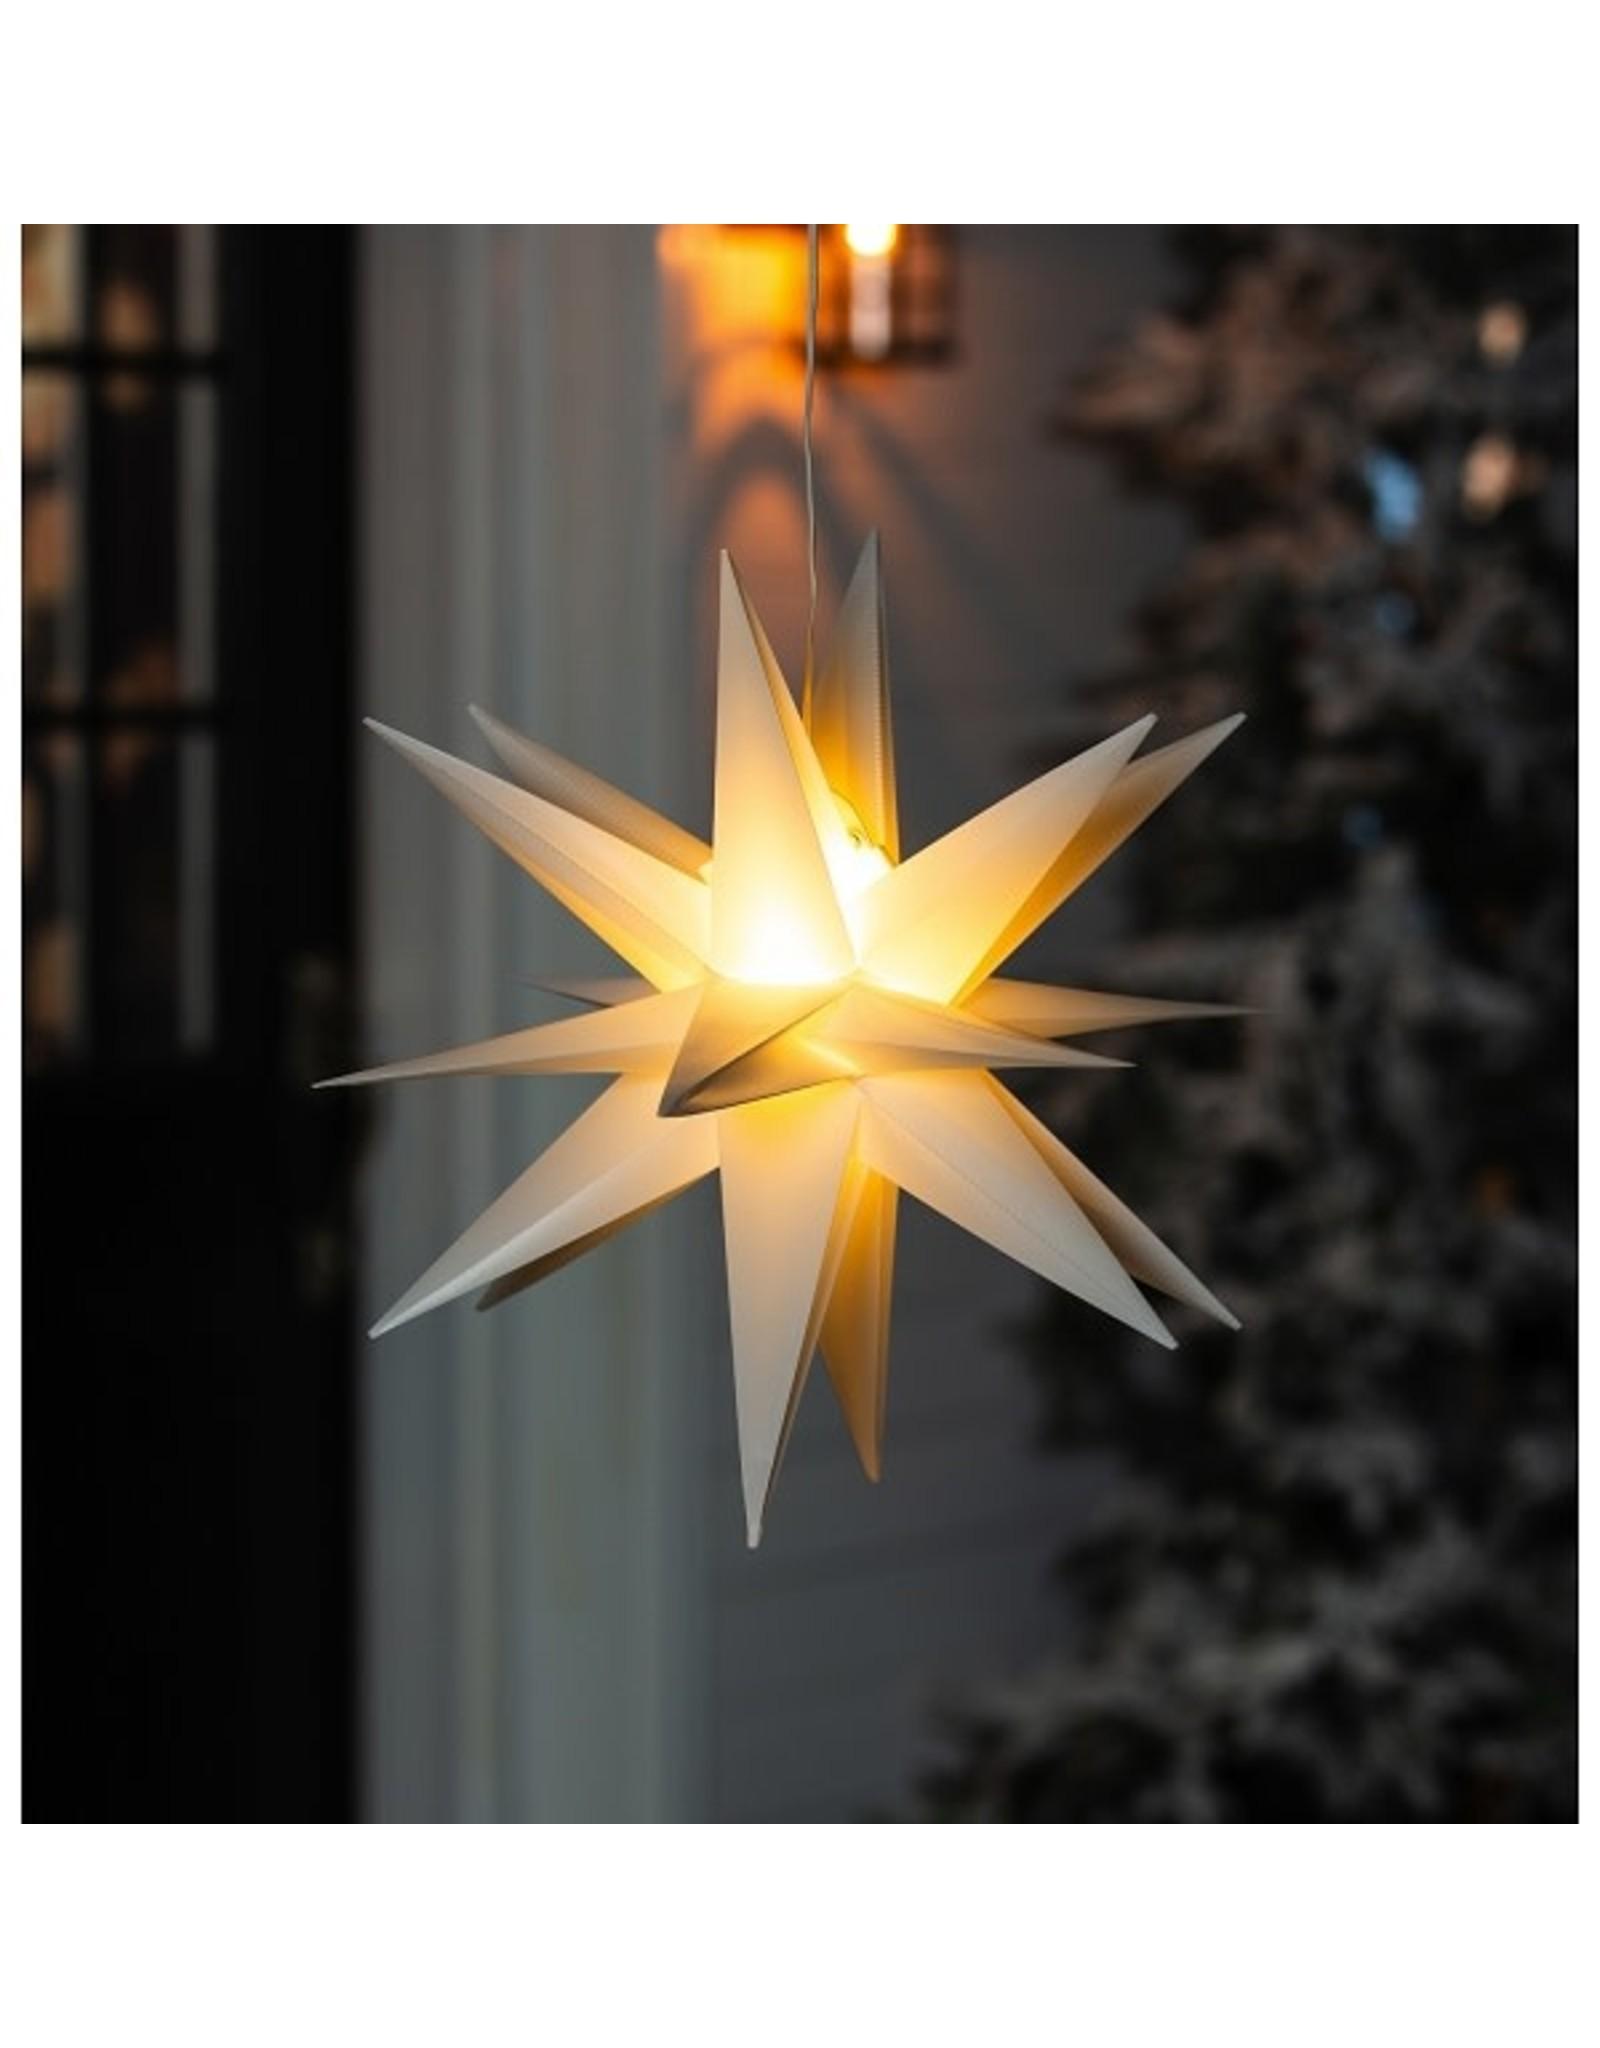 Evergreen COLLAPSIBLE STAR LANTERN